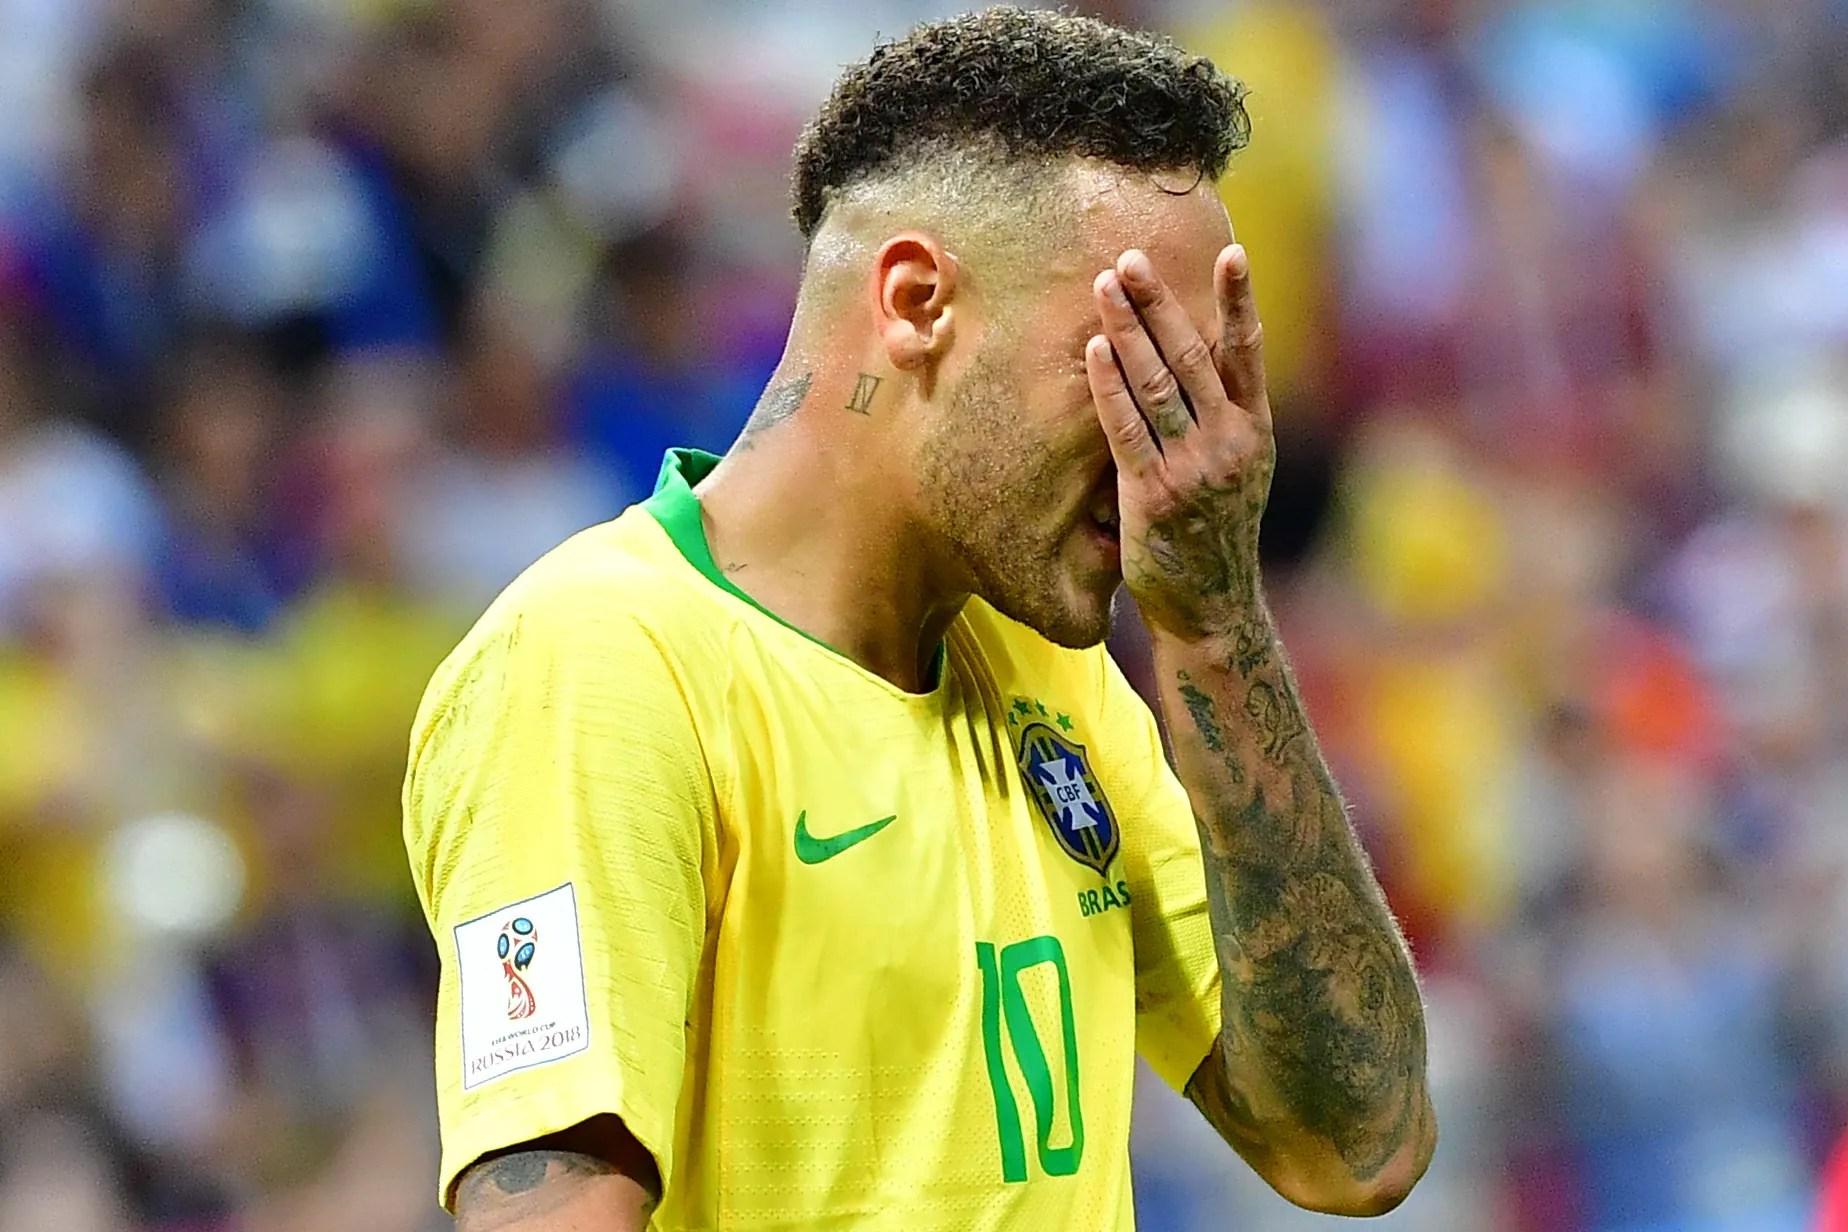 Neymar Jr. Stripped of Brazil Captaincy | HYPEBEAST